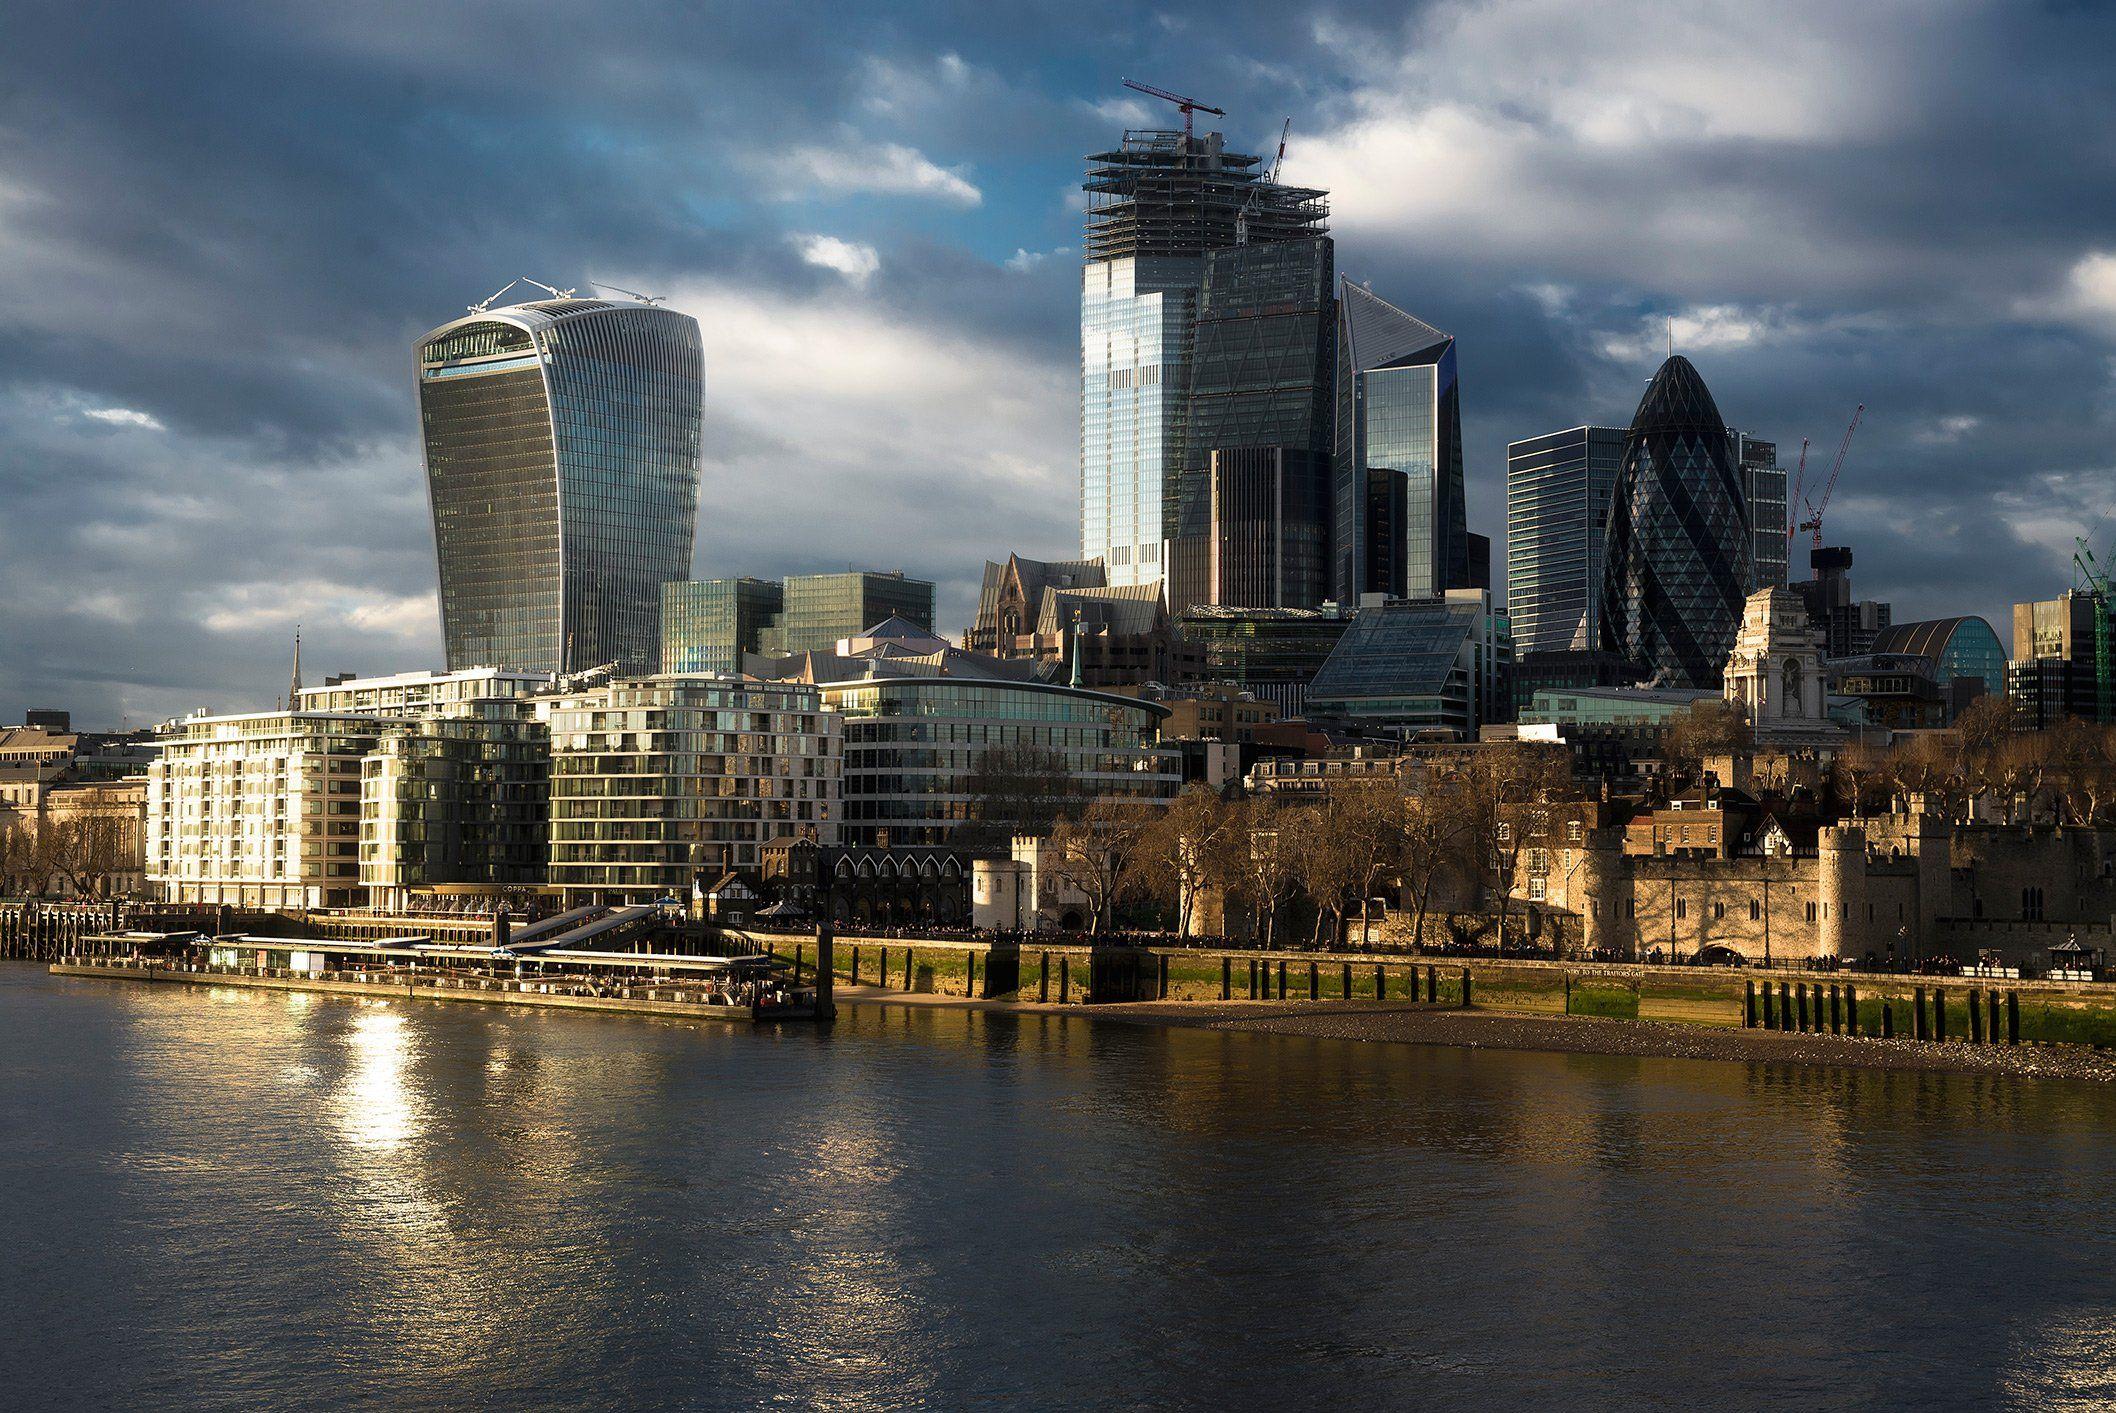 город, архитектура, лондон, великобритания, Алексей Ермаков